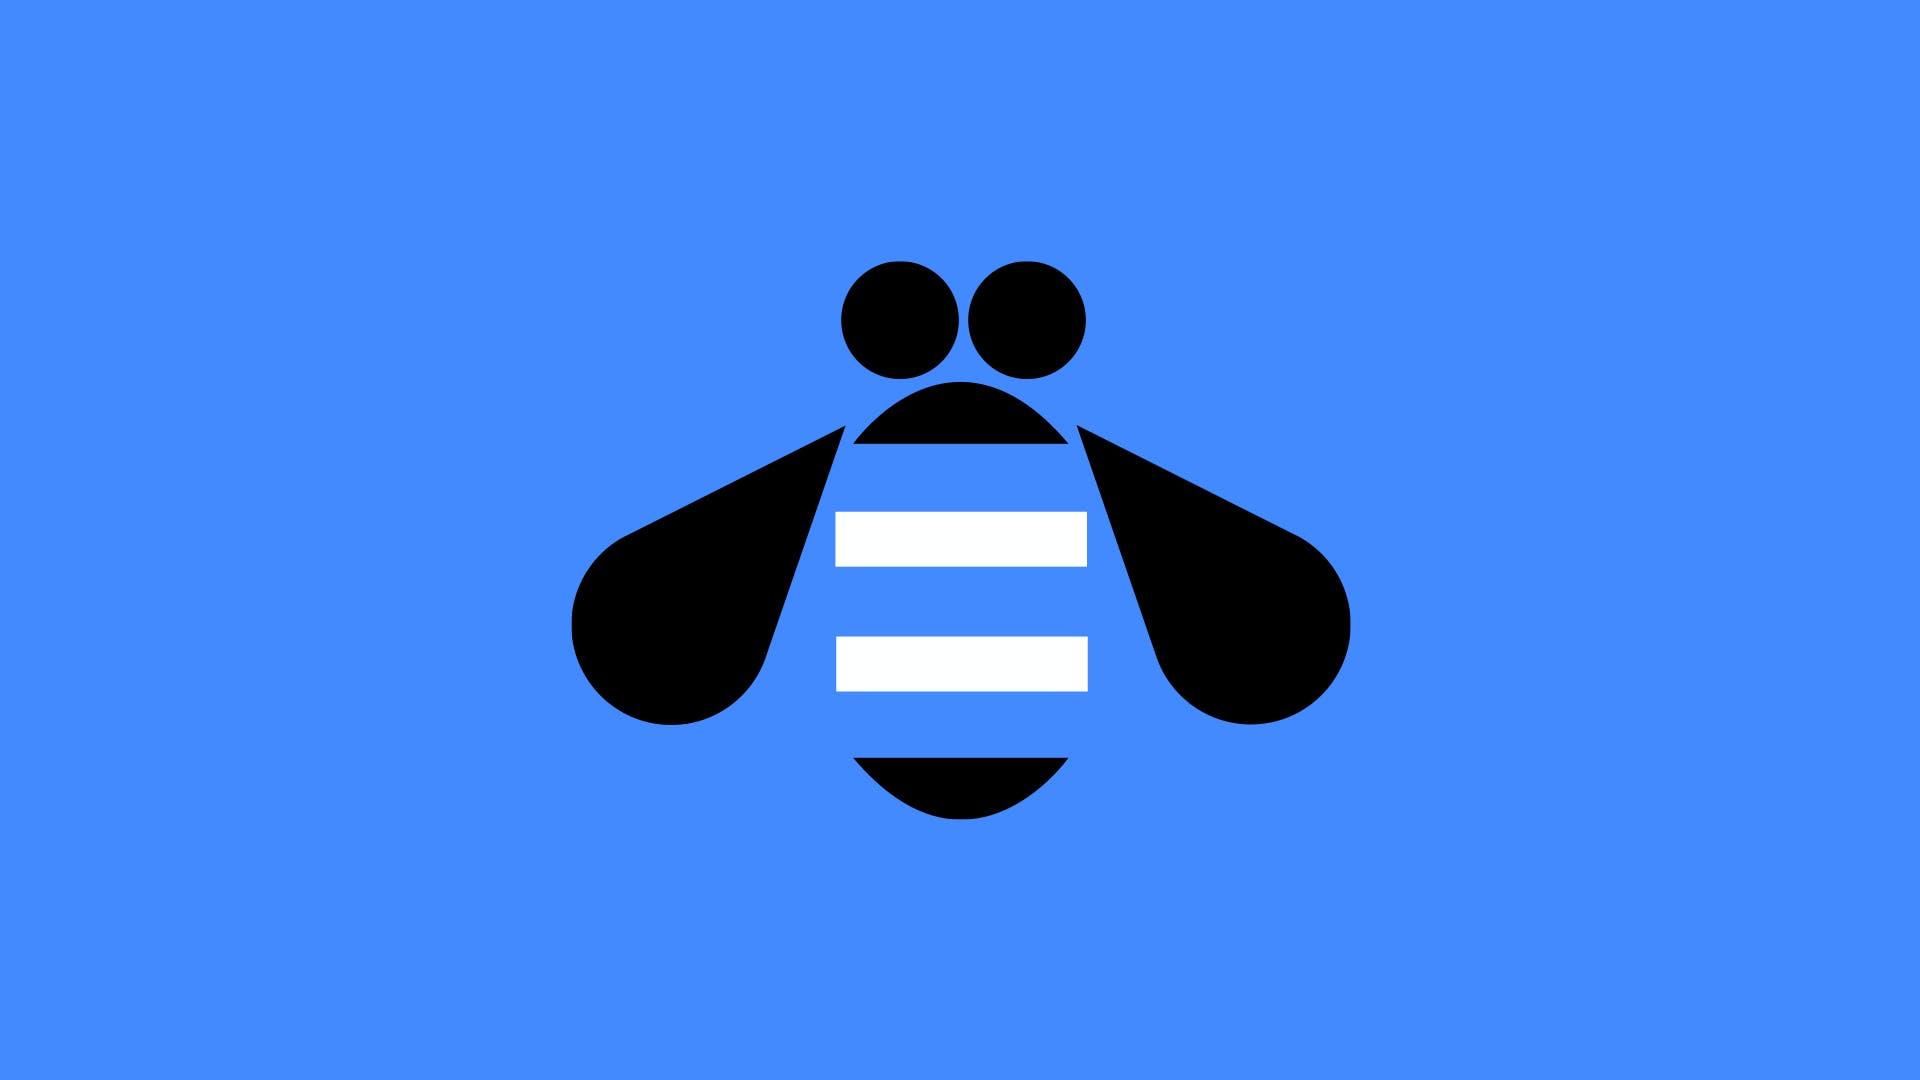 Illustration of the IBM bee logo